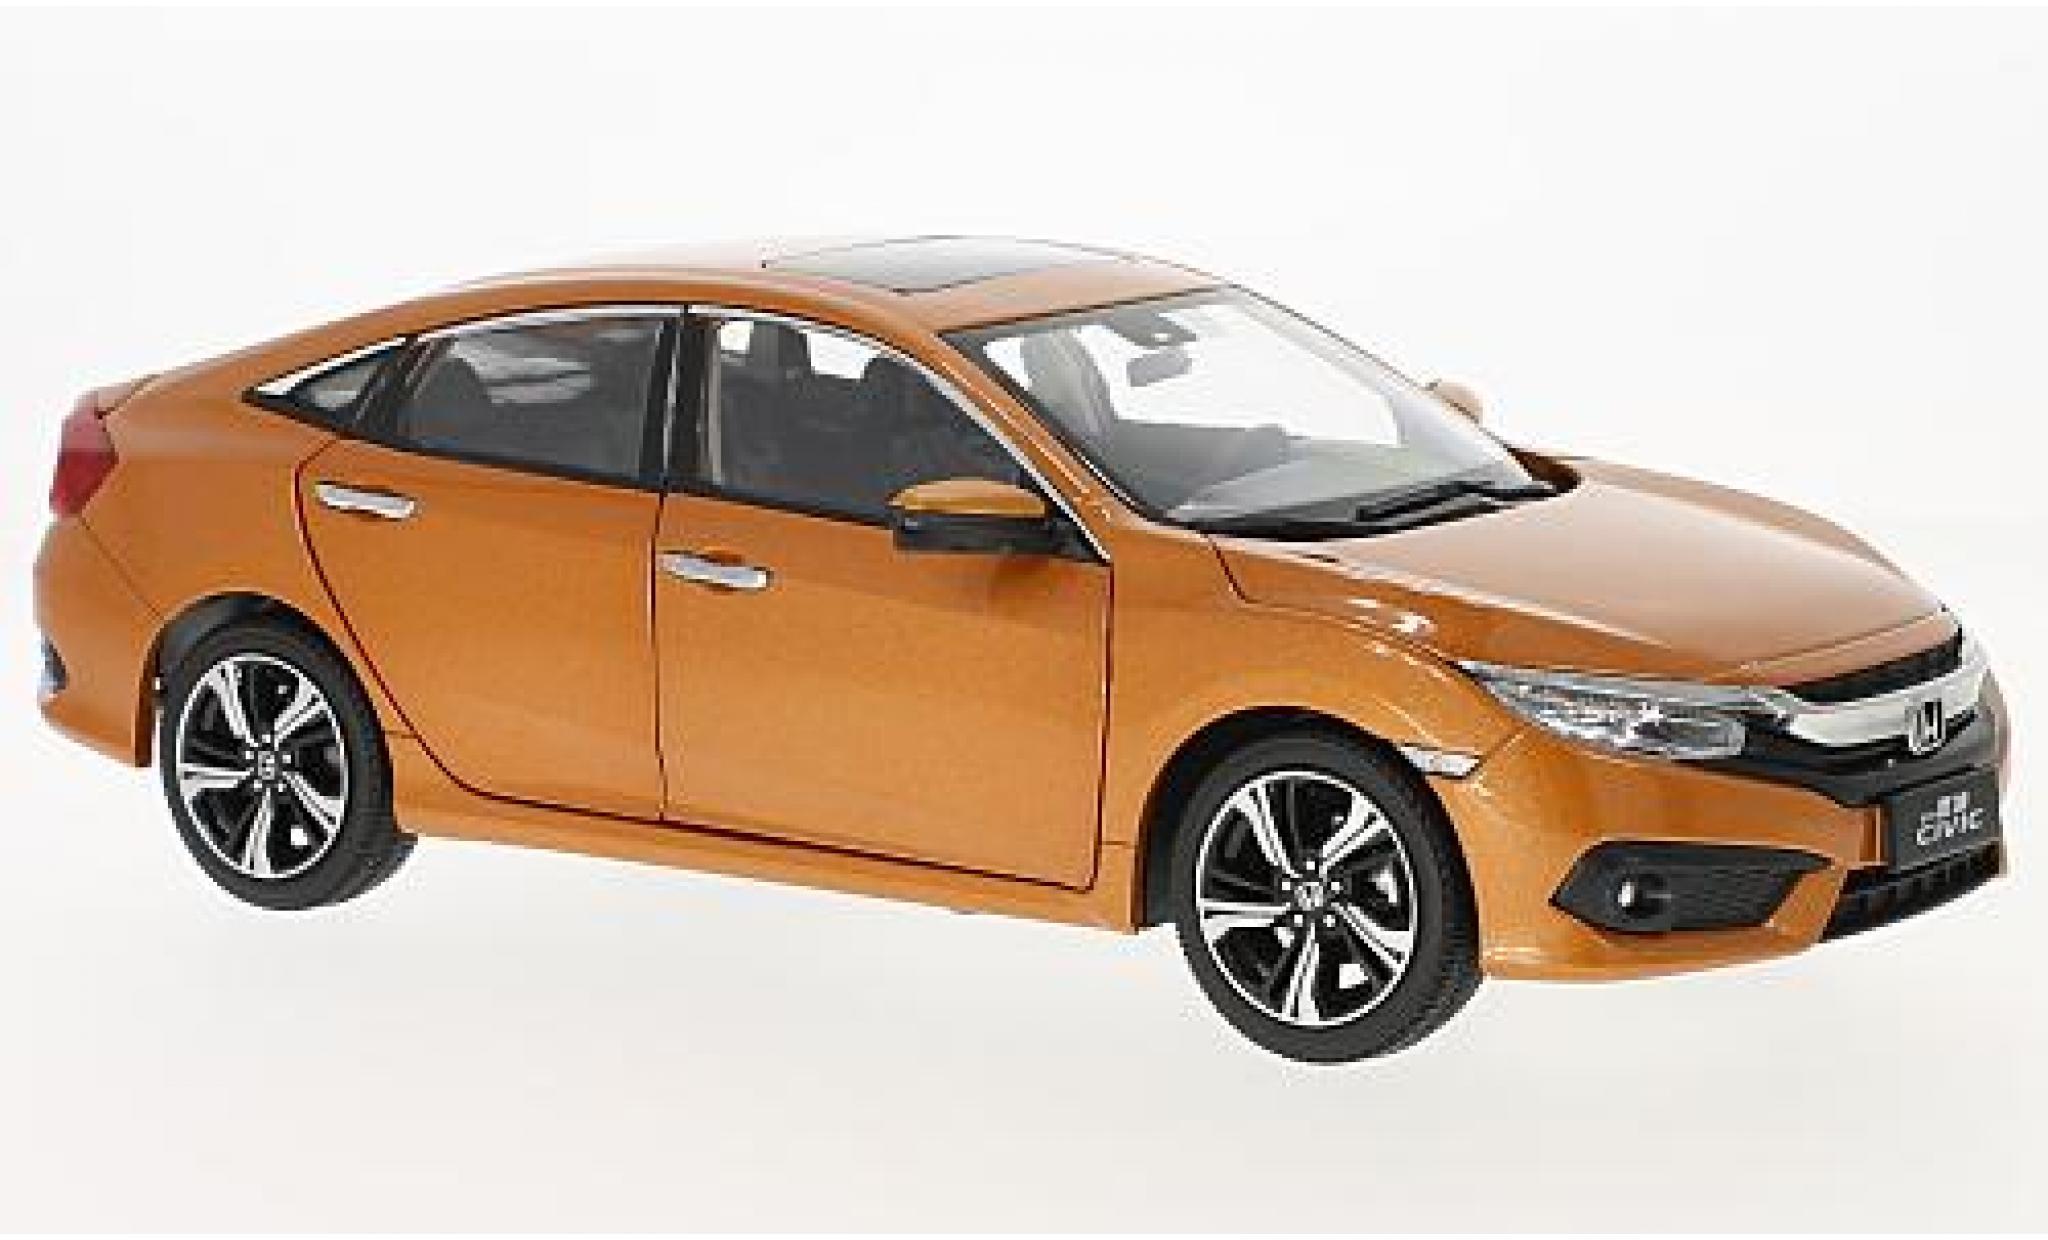 Honda Civic 1/18 Paudi metallise orange 2016